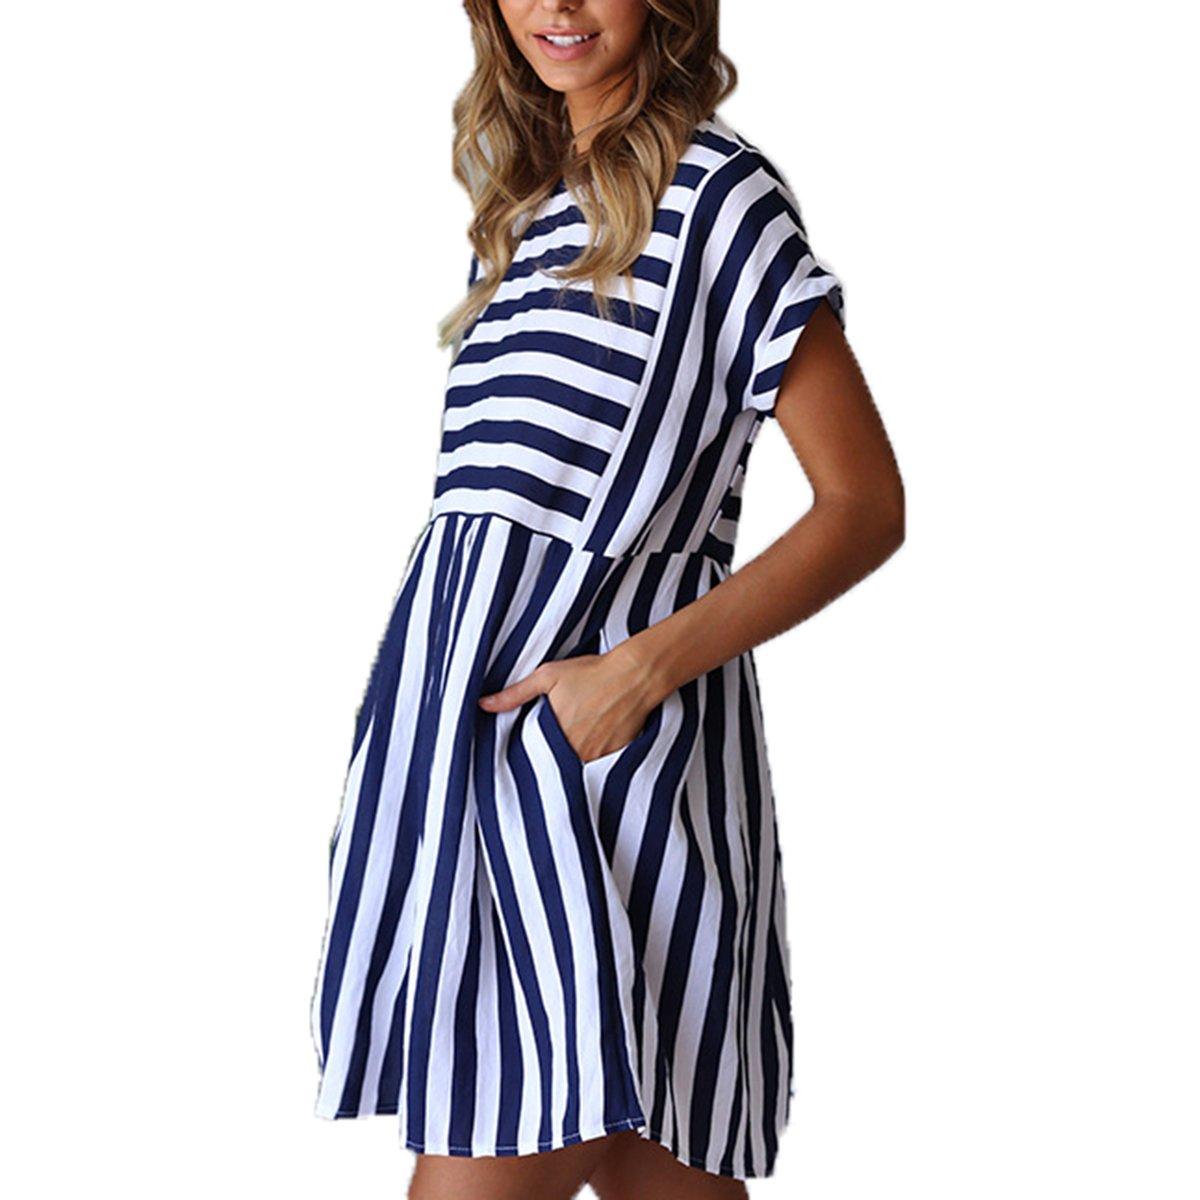 df9cd567cd21 ChongXiao Cute Dresses for Women Short Casual Cute Short Sleeve Mini Summer  Striped Dress at Amazon Women s Clothing store